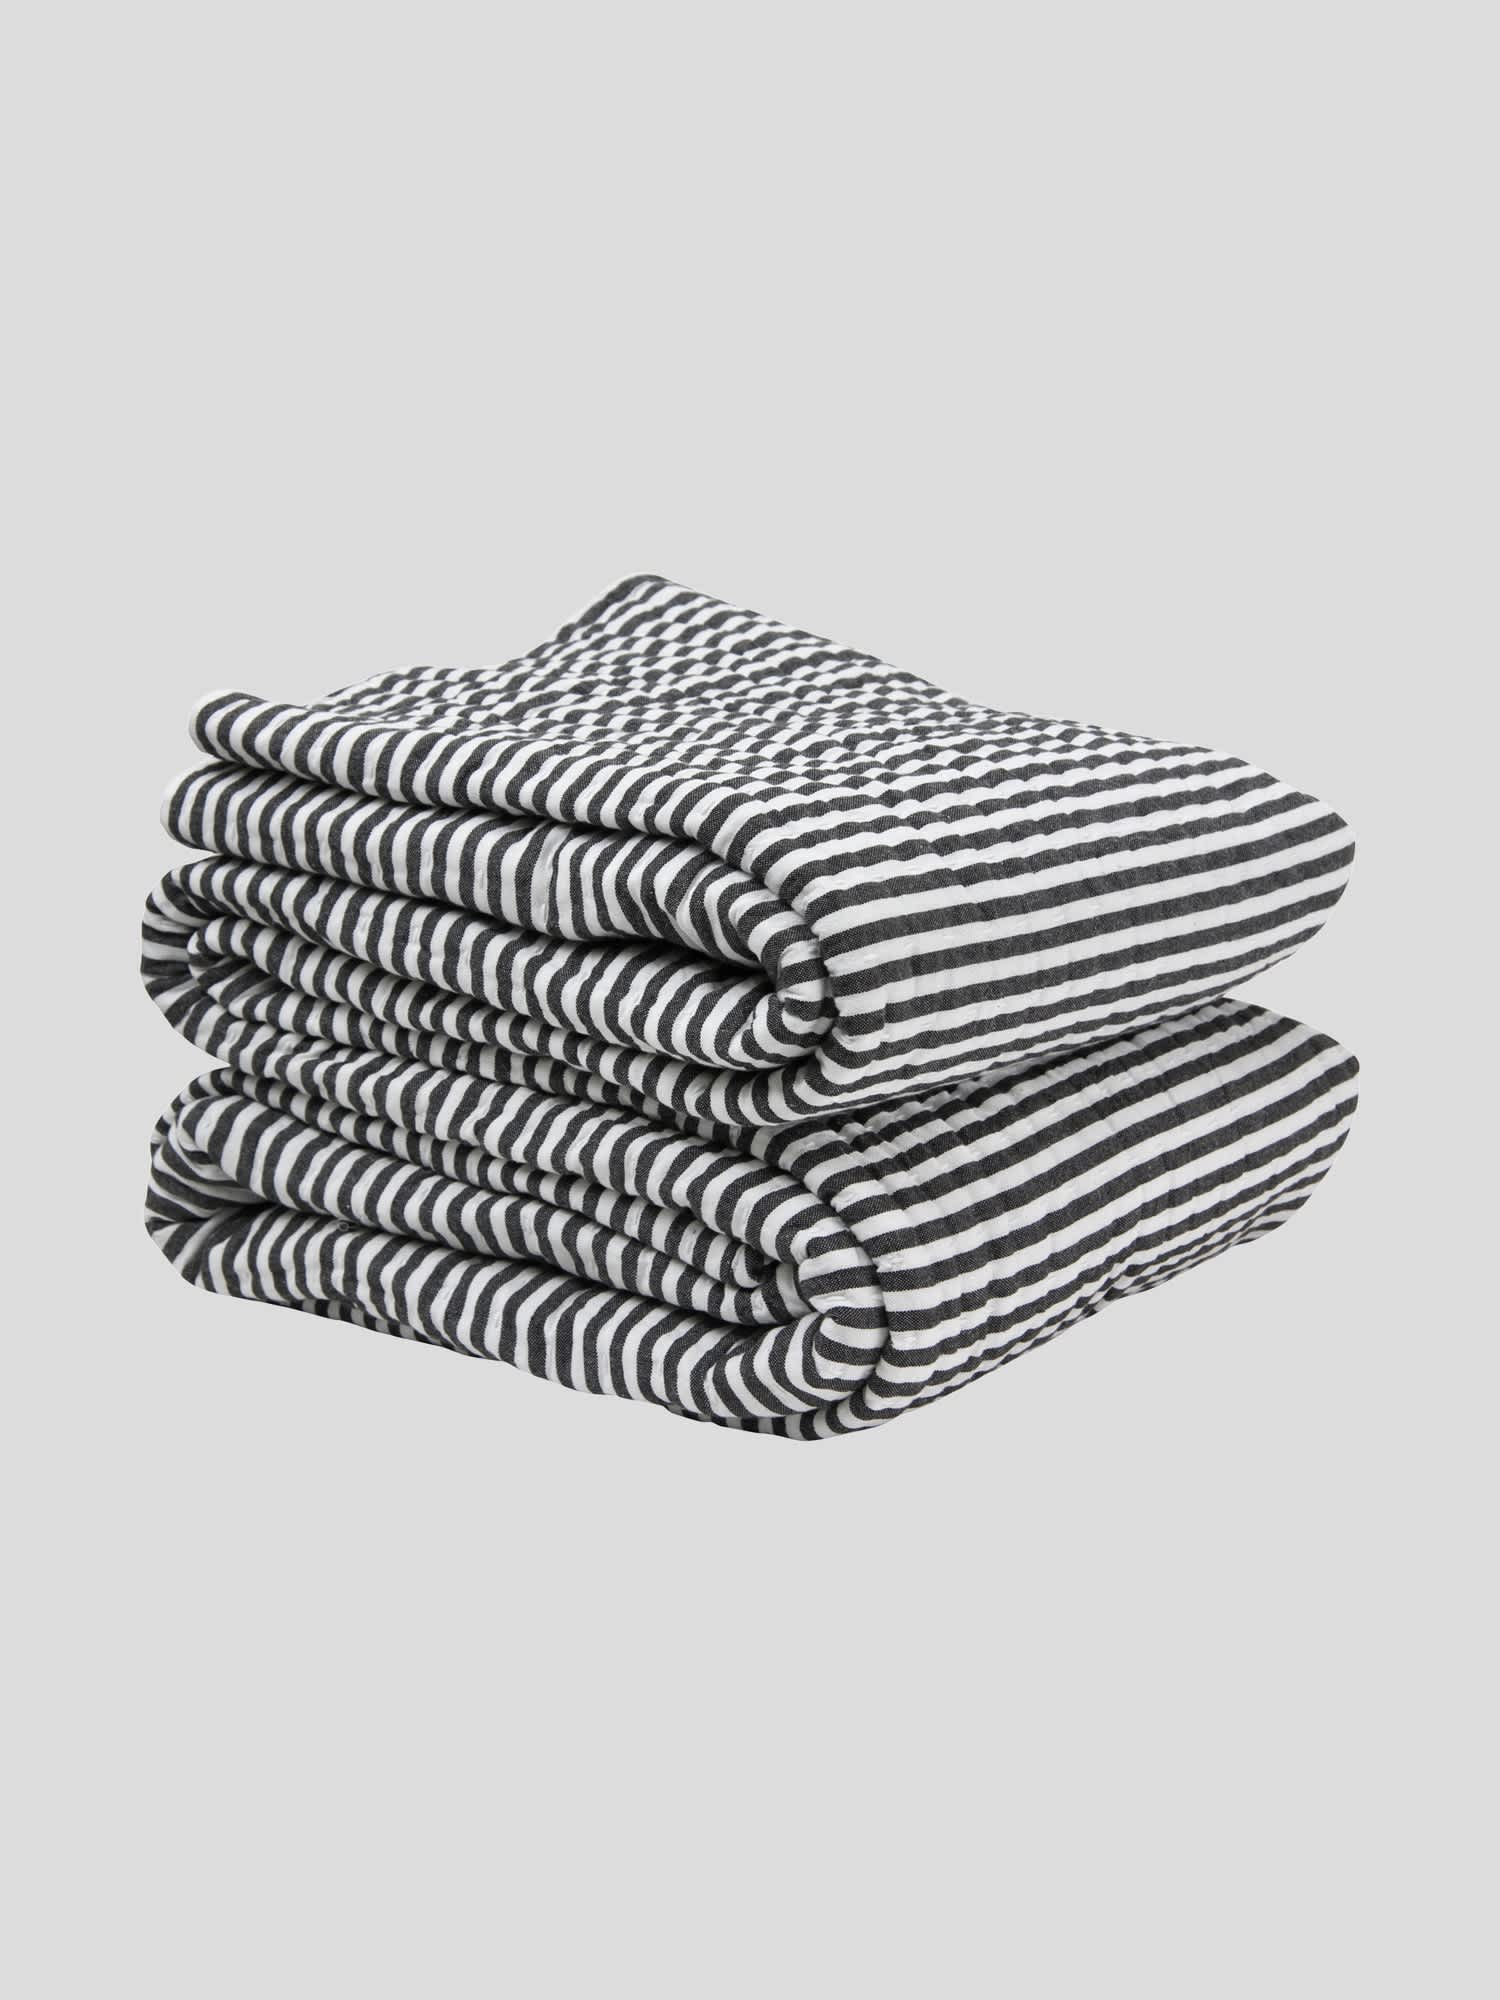 Wallace Cotton Large Black Corinthian Cotton Bedspread Blanket